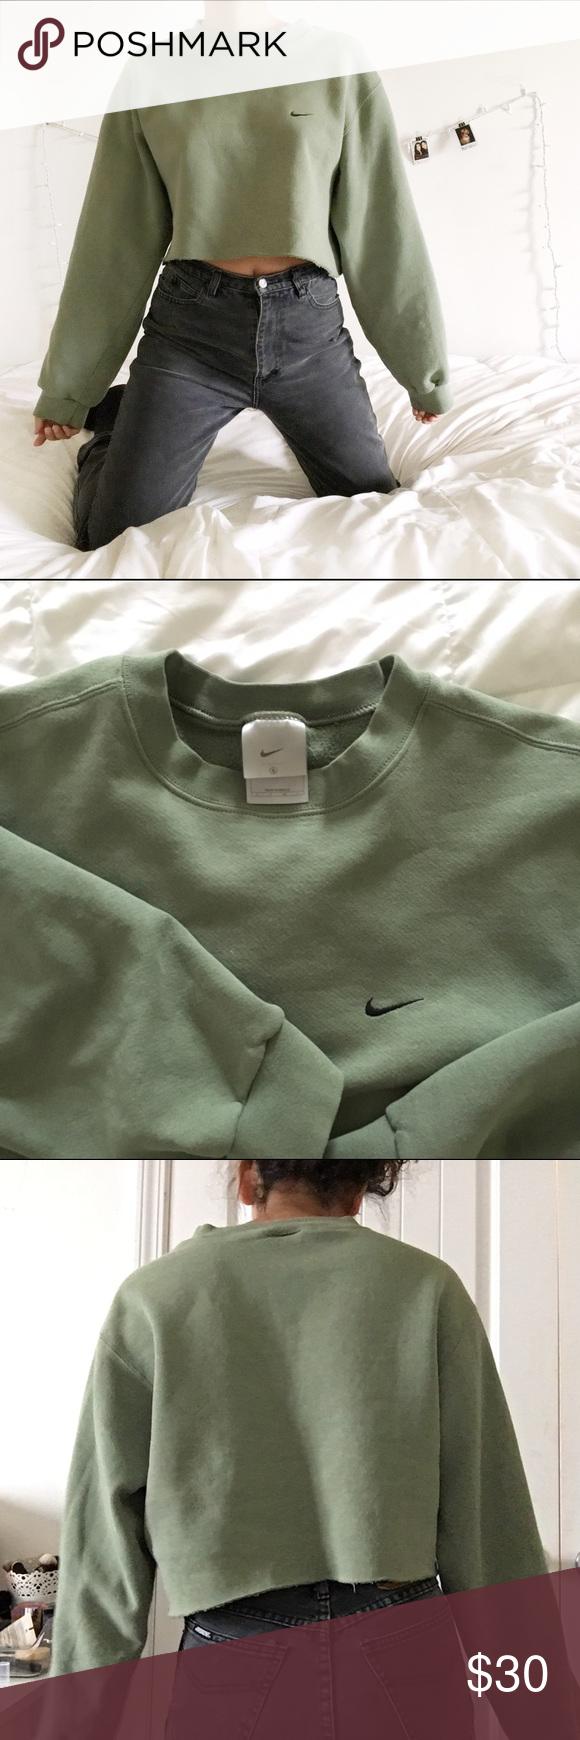 nikeroshe$19 on | Vintage nike sweatshirt, Clothes, Fashion